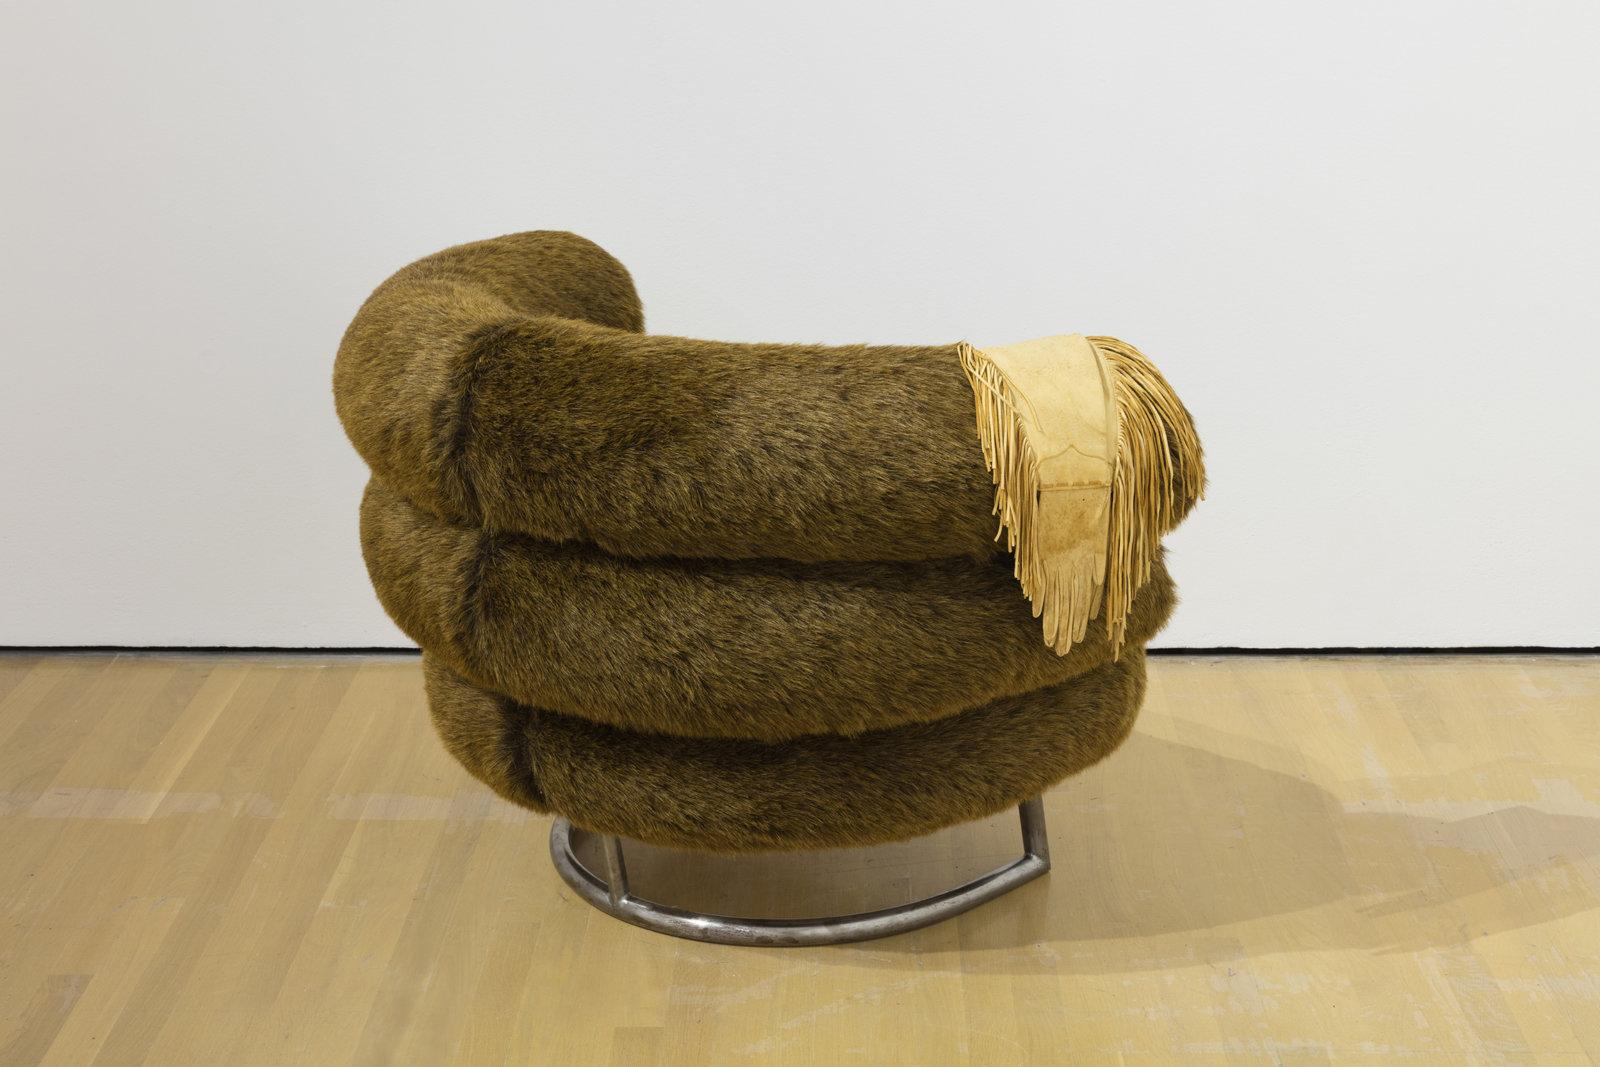 Liz Magor, Banff Chair, 1991, steel base, soft polyurethane foam, synthetic fur, deerskin gloves, 30 x 35 x 44 in. (77 x 88 x 111 cm). Installation view, Habitude, Musée d'art contemporain de Montréal, 2016 by Liz Magor